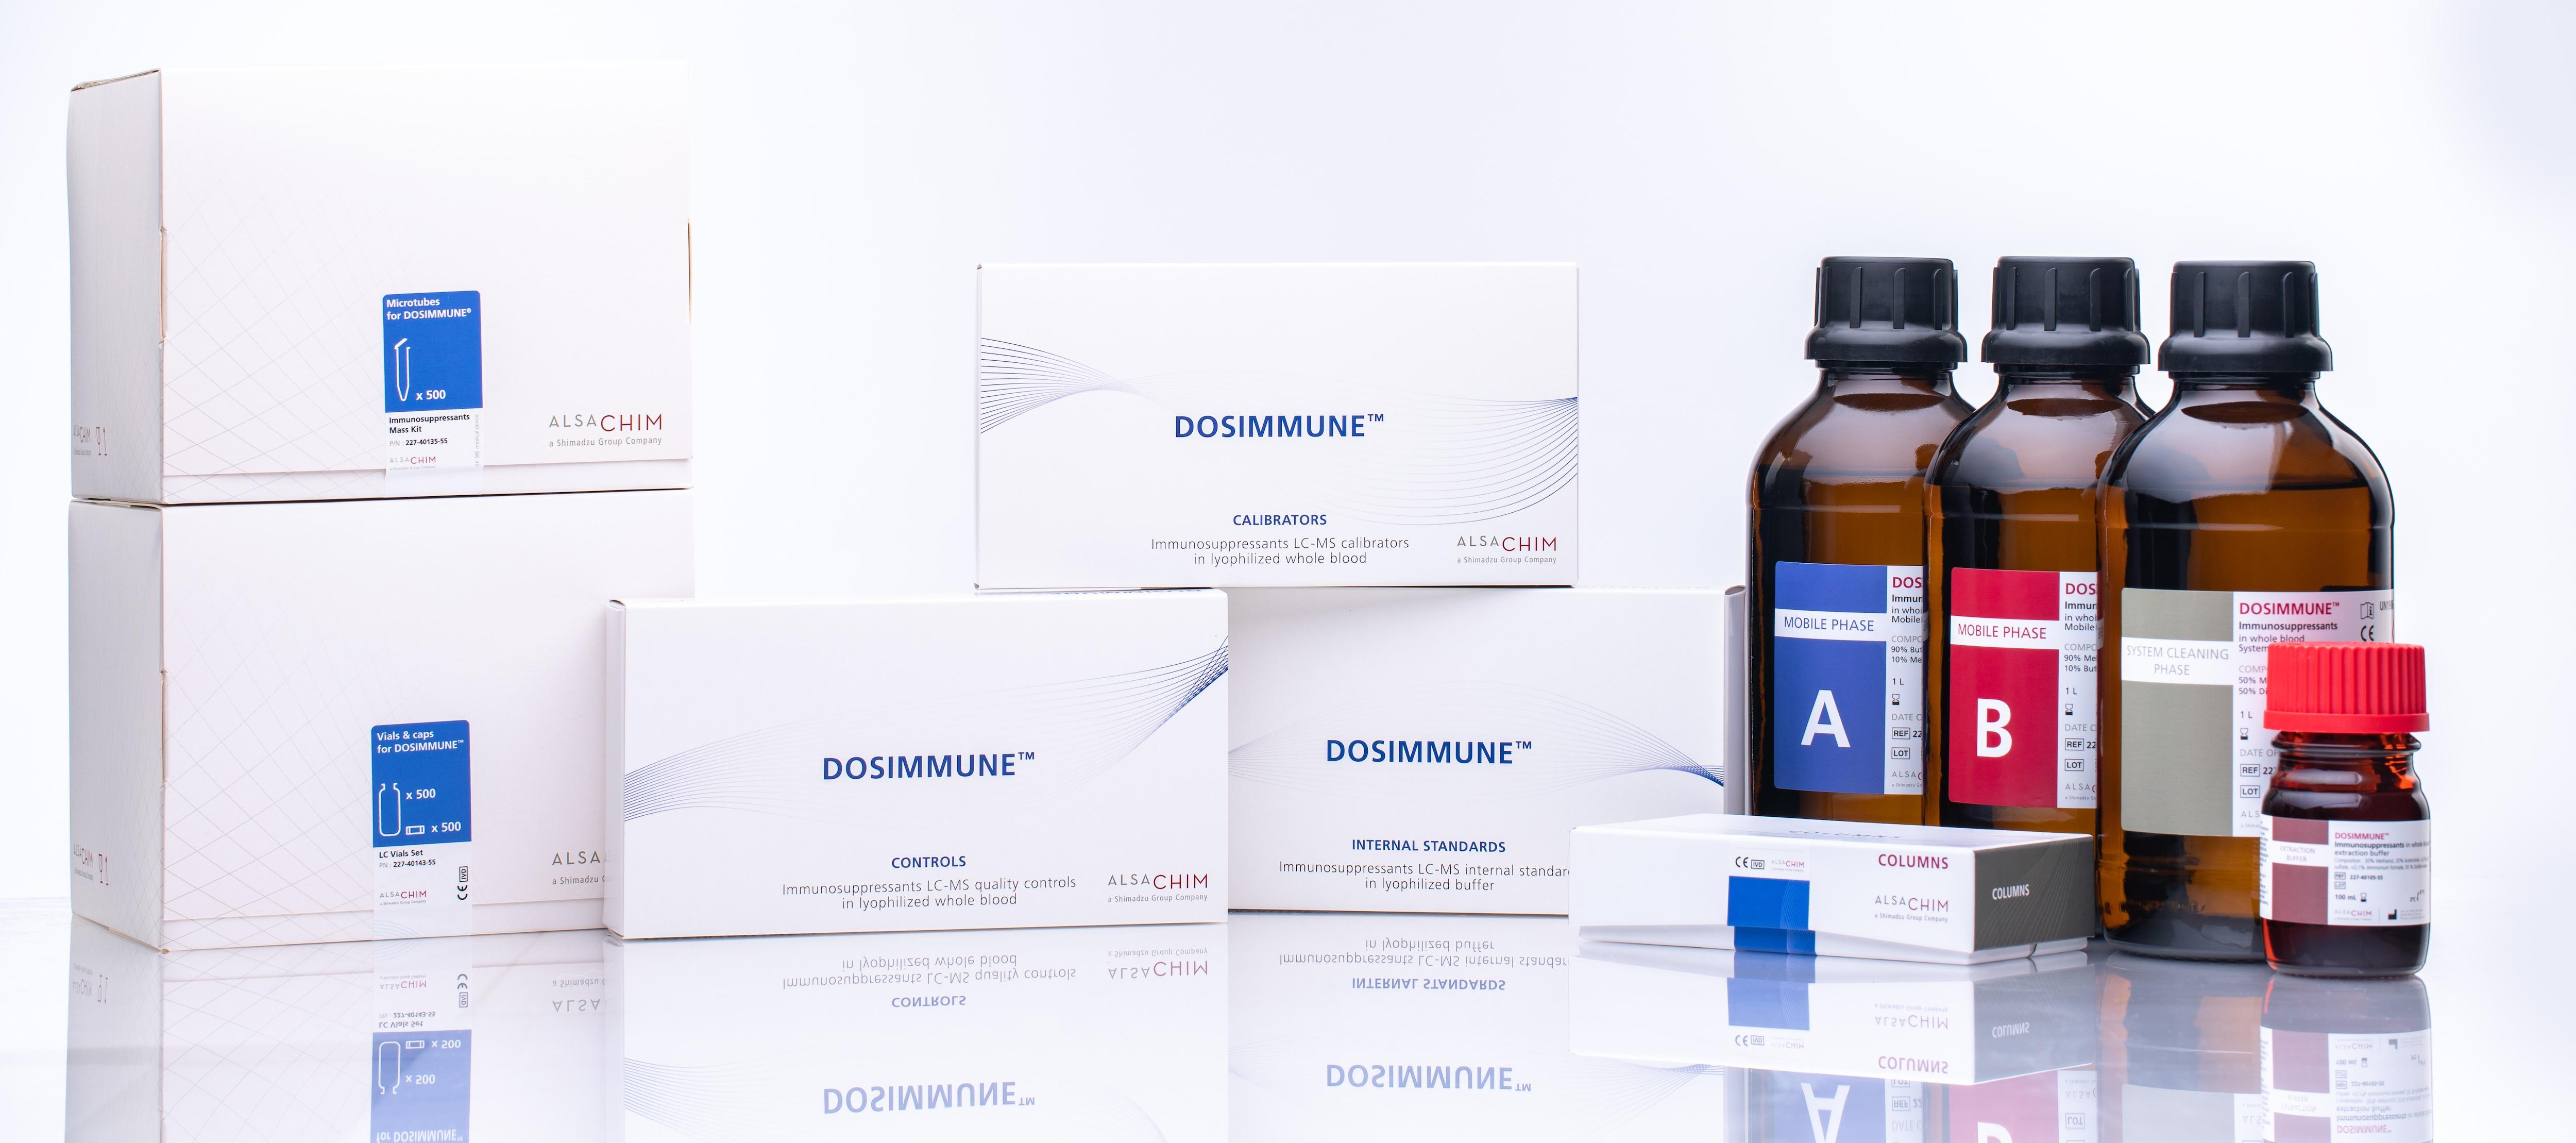 DOSIMMUNE:LC-MS/MS 用免疫抑制剤分析キット : 株式会社島津製作所